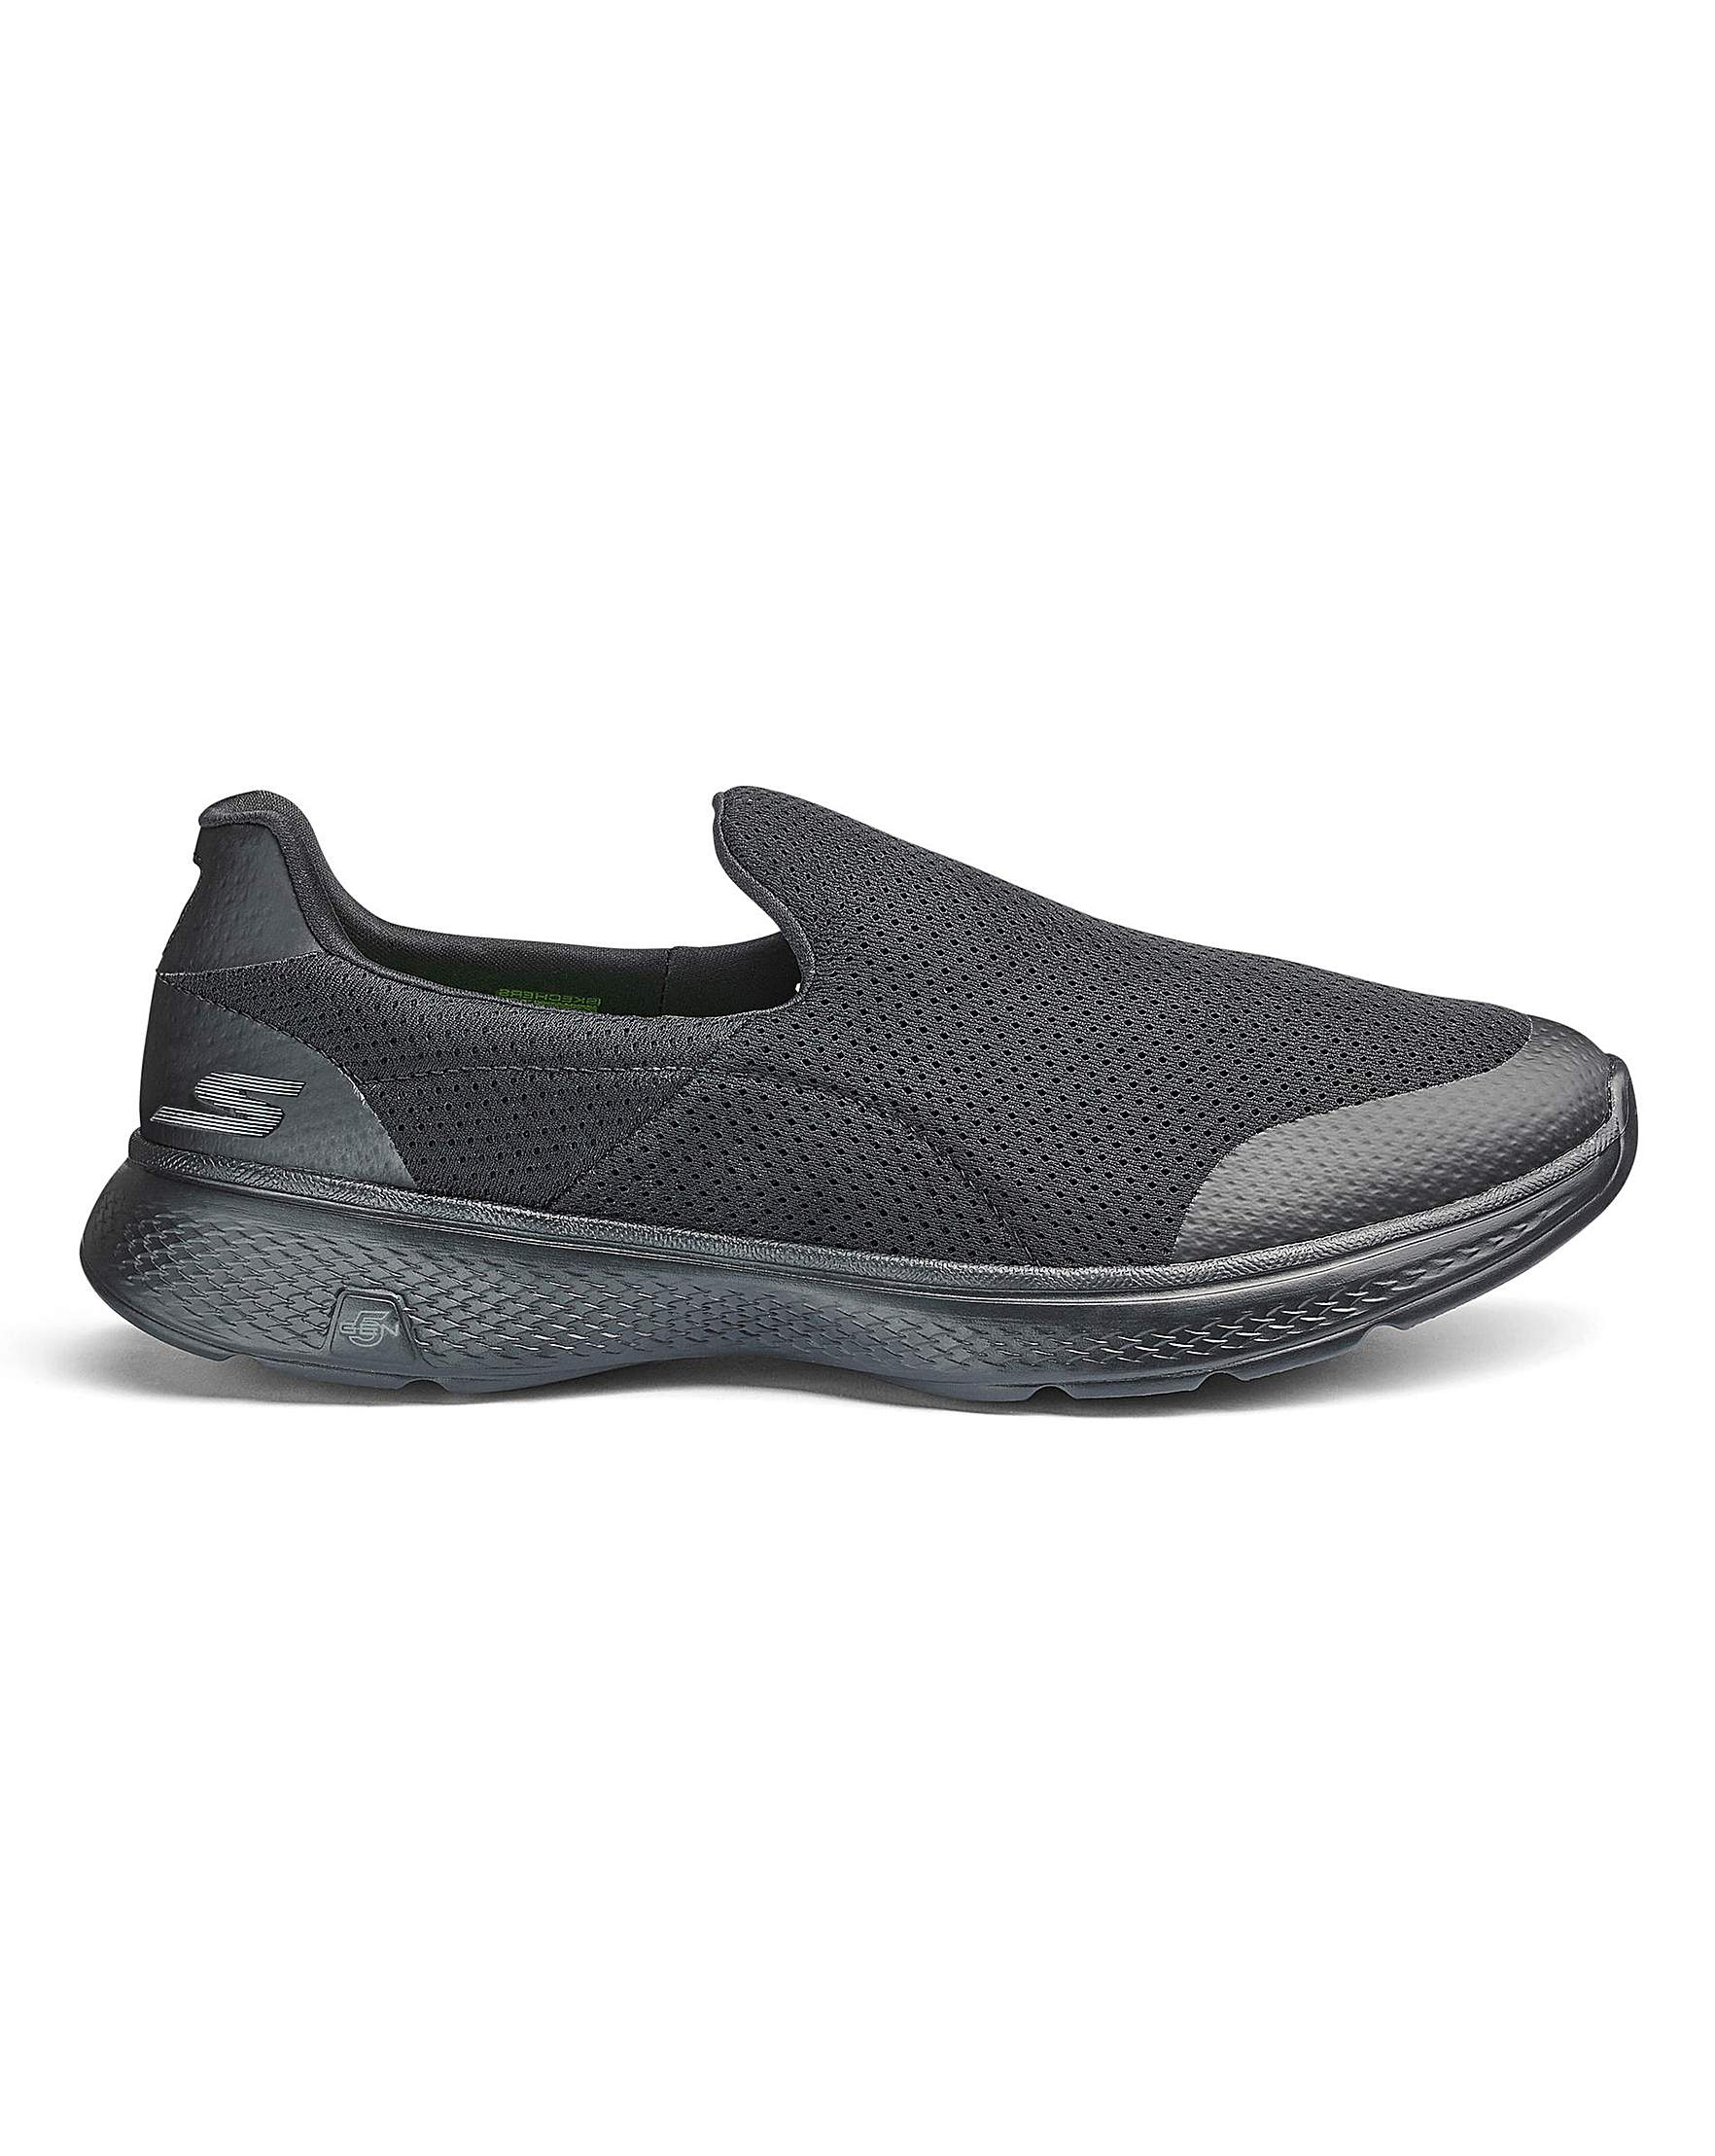 3aa5b8851cd6 Skechers Go Walk 4 Incredible Wide Fit Trainers